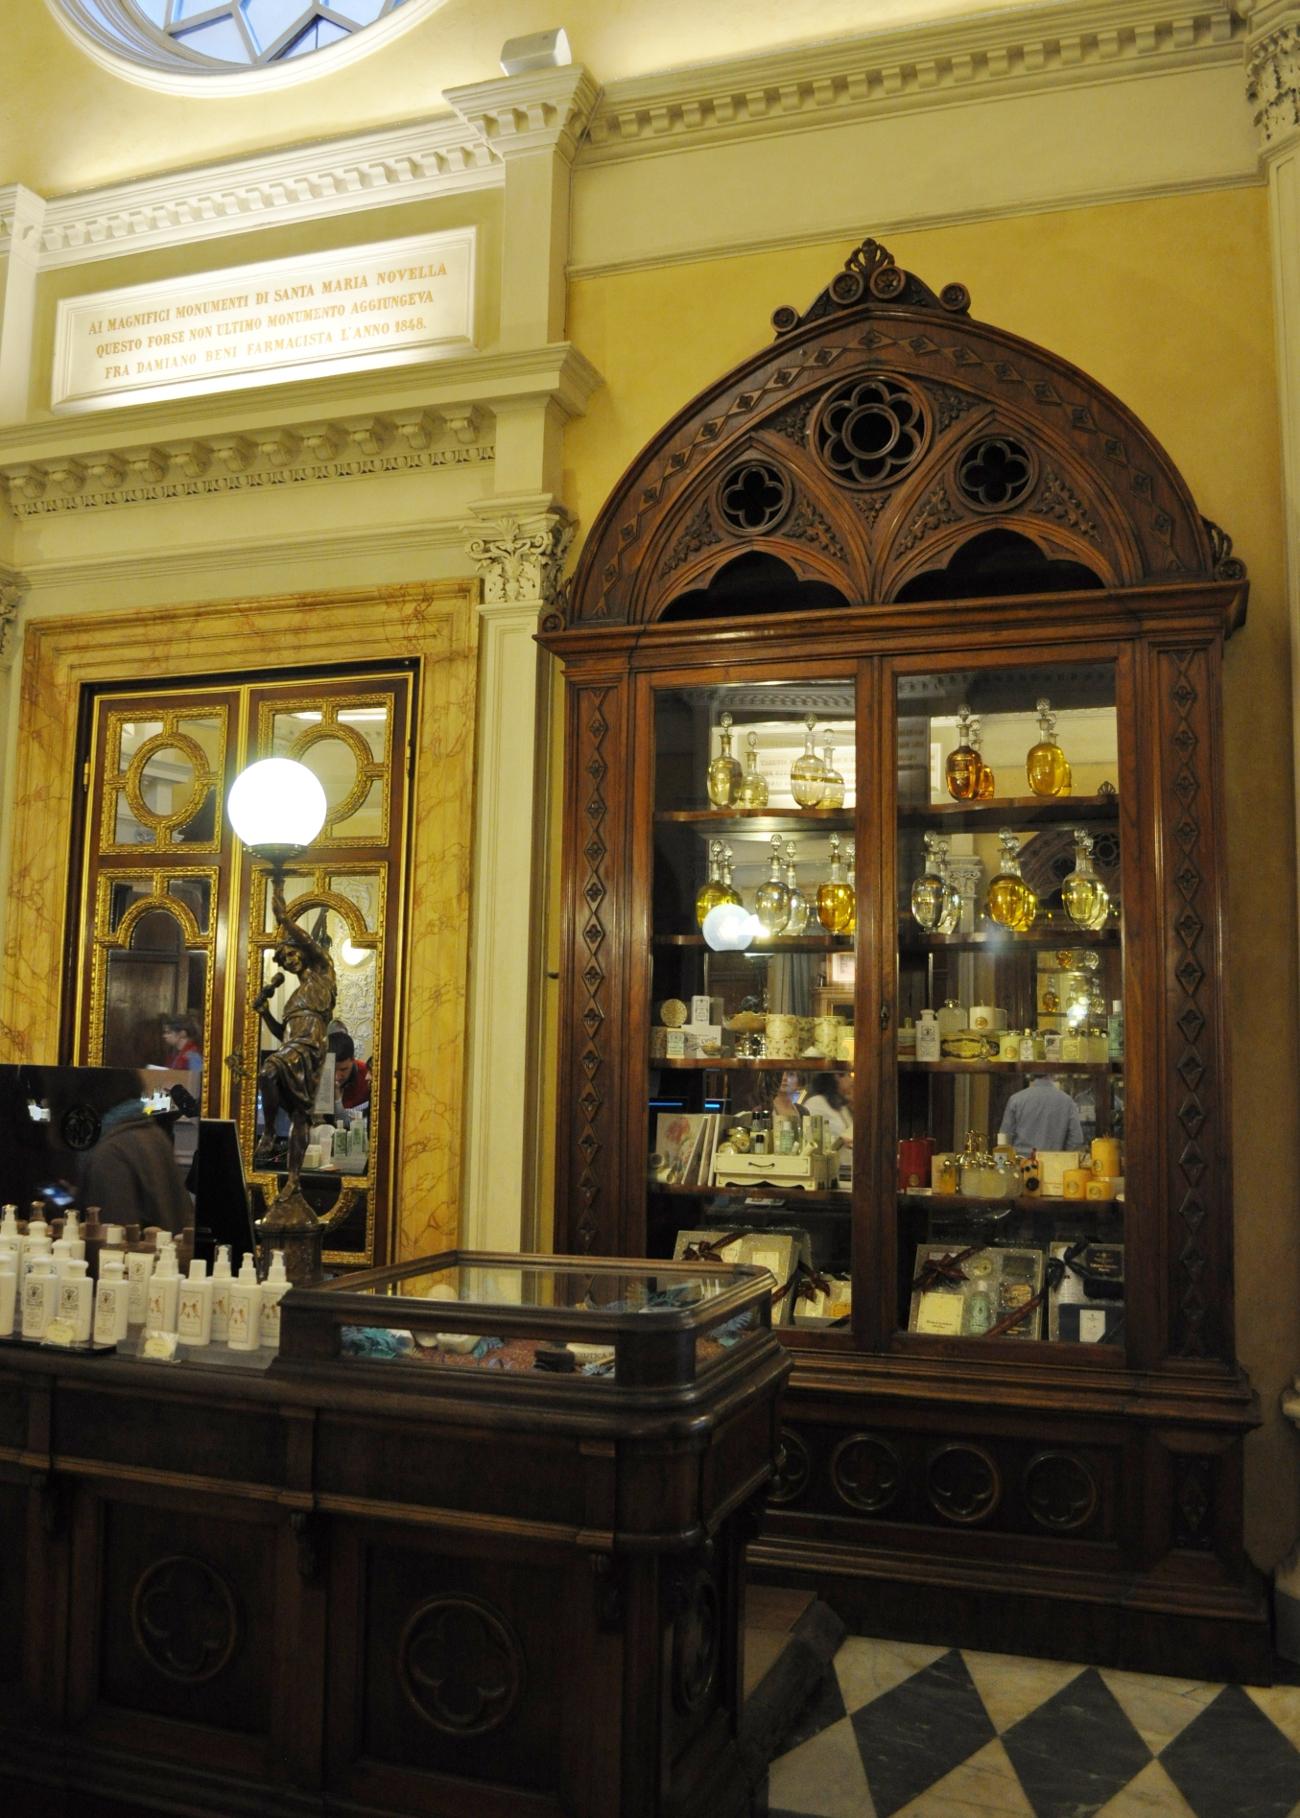 rocaille-blog-officina-profumo-farmaceutica-santa-maria-novella-shop-negozio-storico-sede-firenze-70